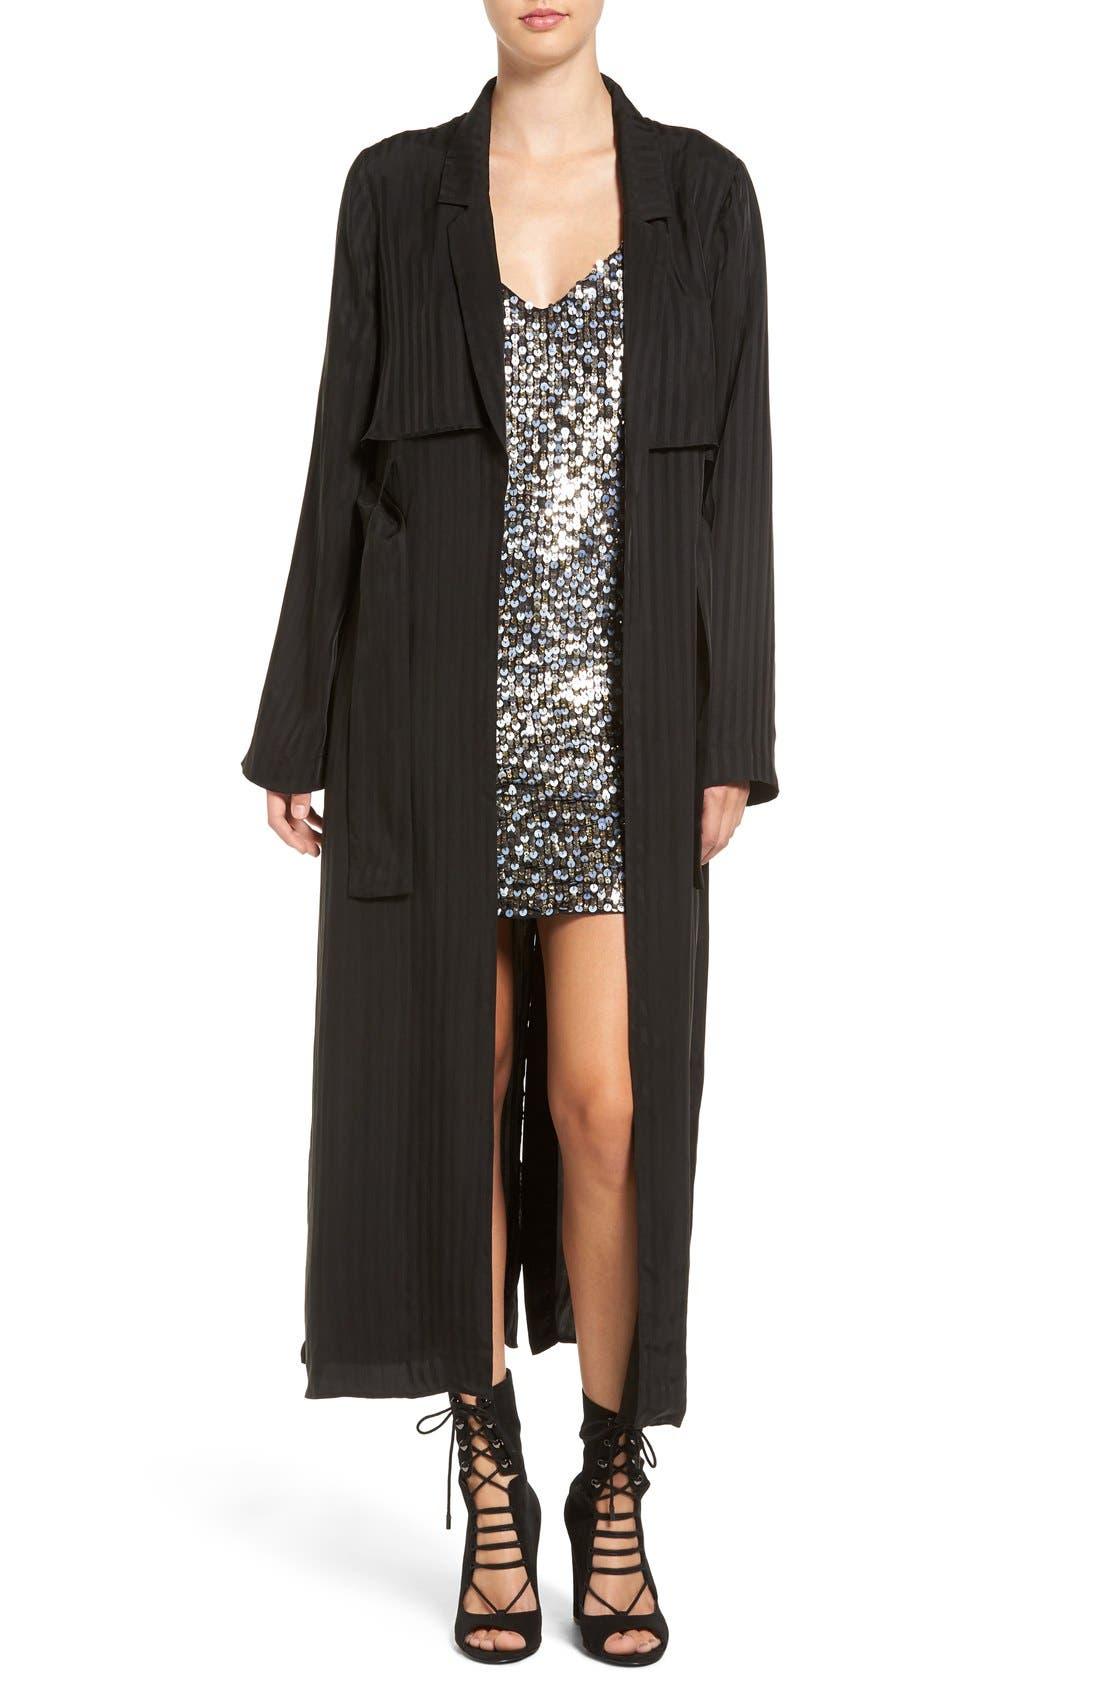 Alternate Image 1 Selected - KENDALL + KYLIE 'Tuxedo' Long Stripe Jacket